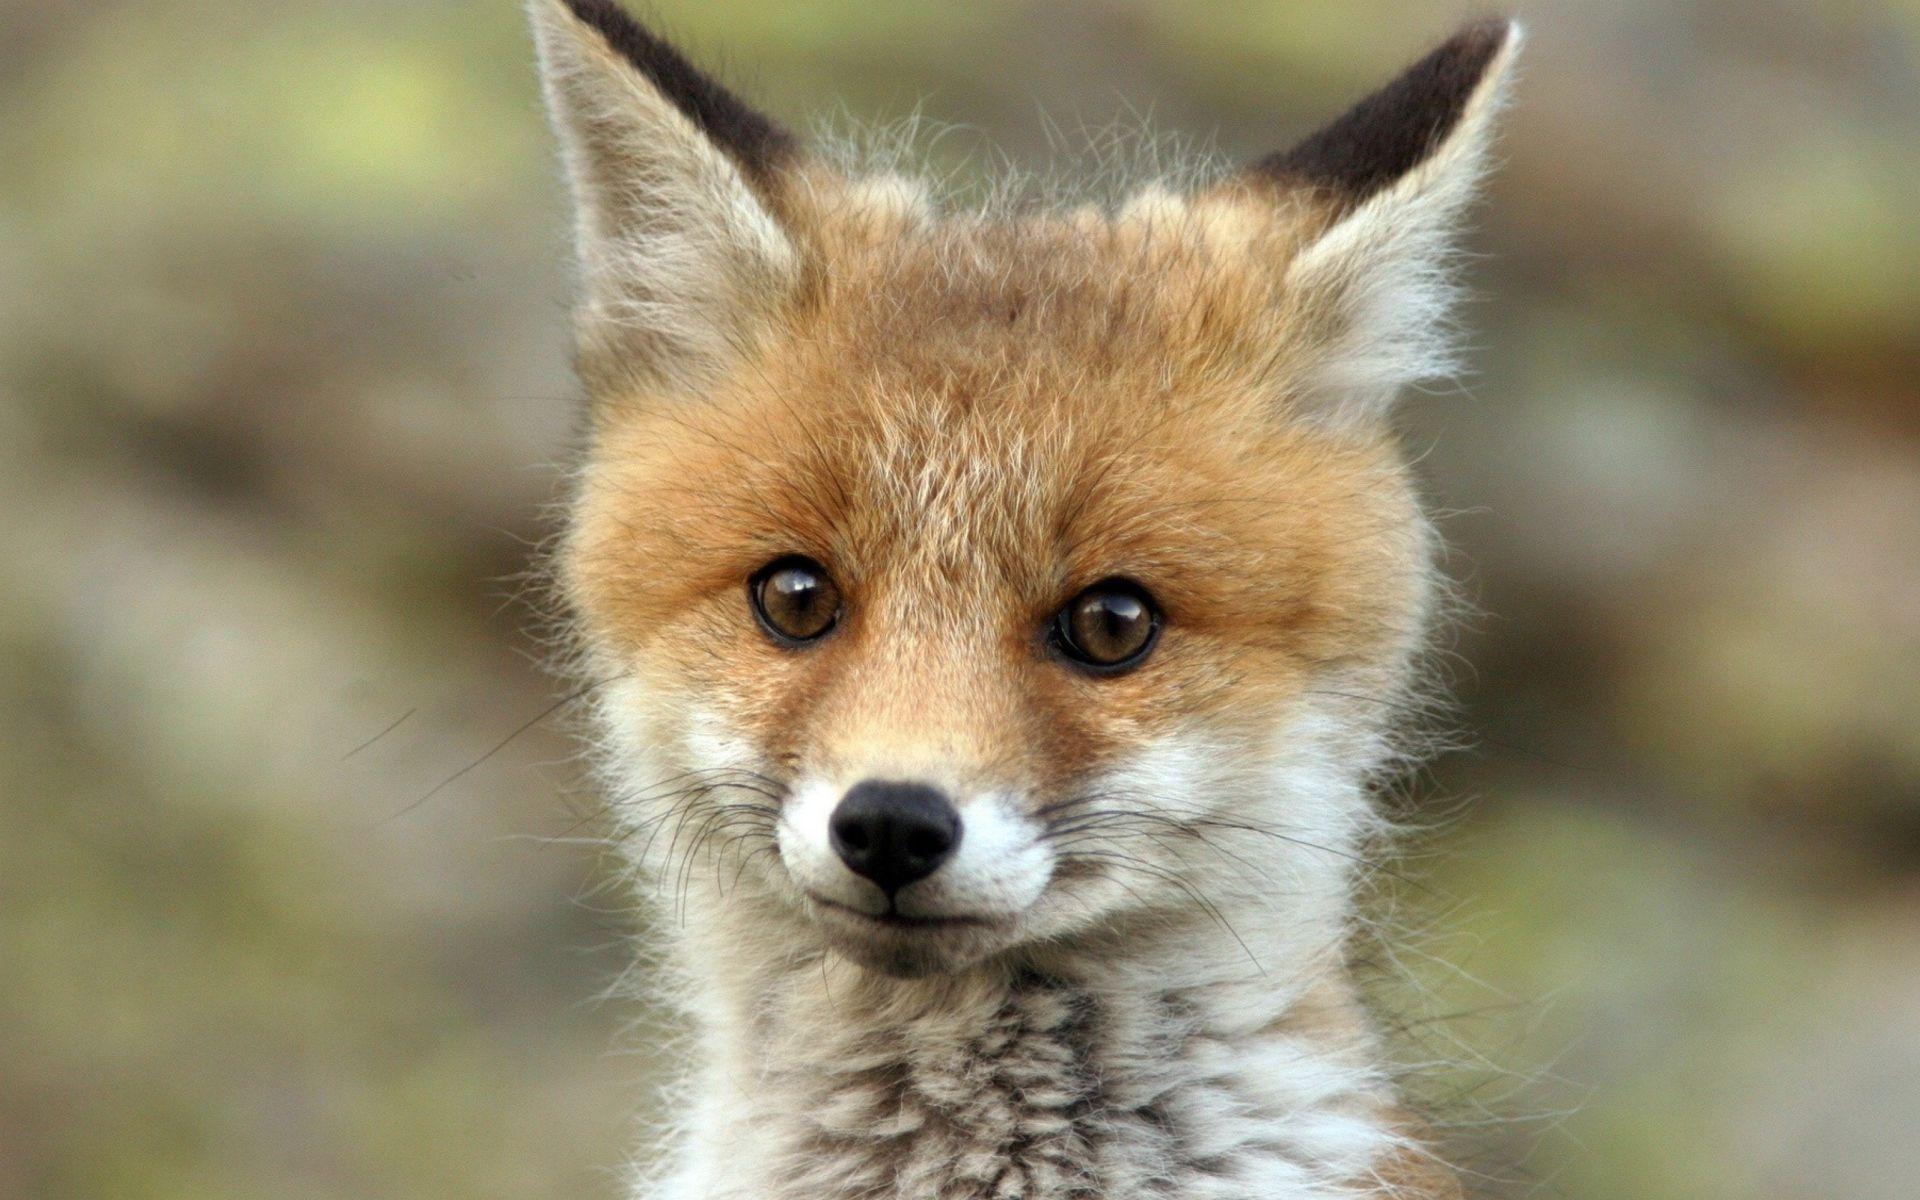 Adorables animales salvajes - zorro